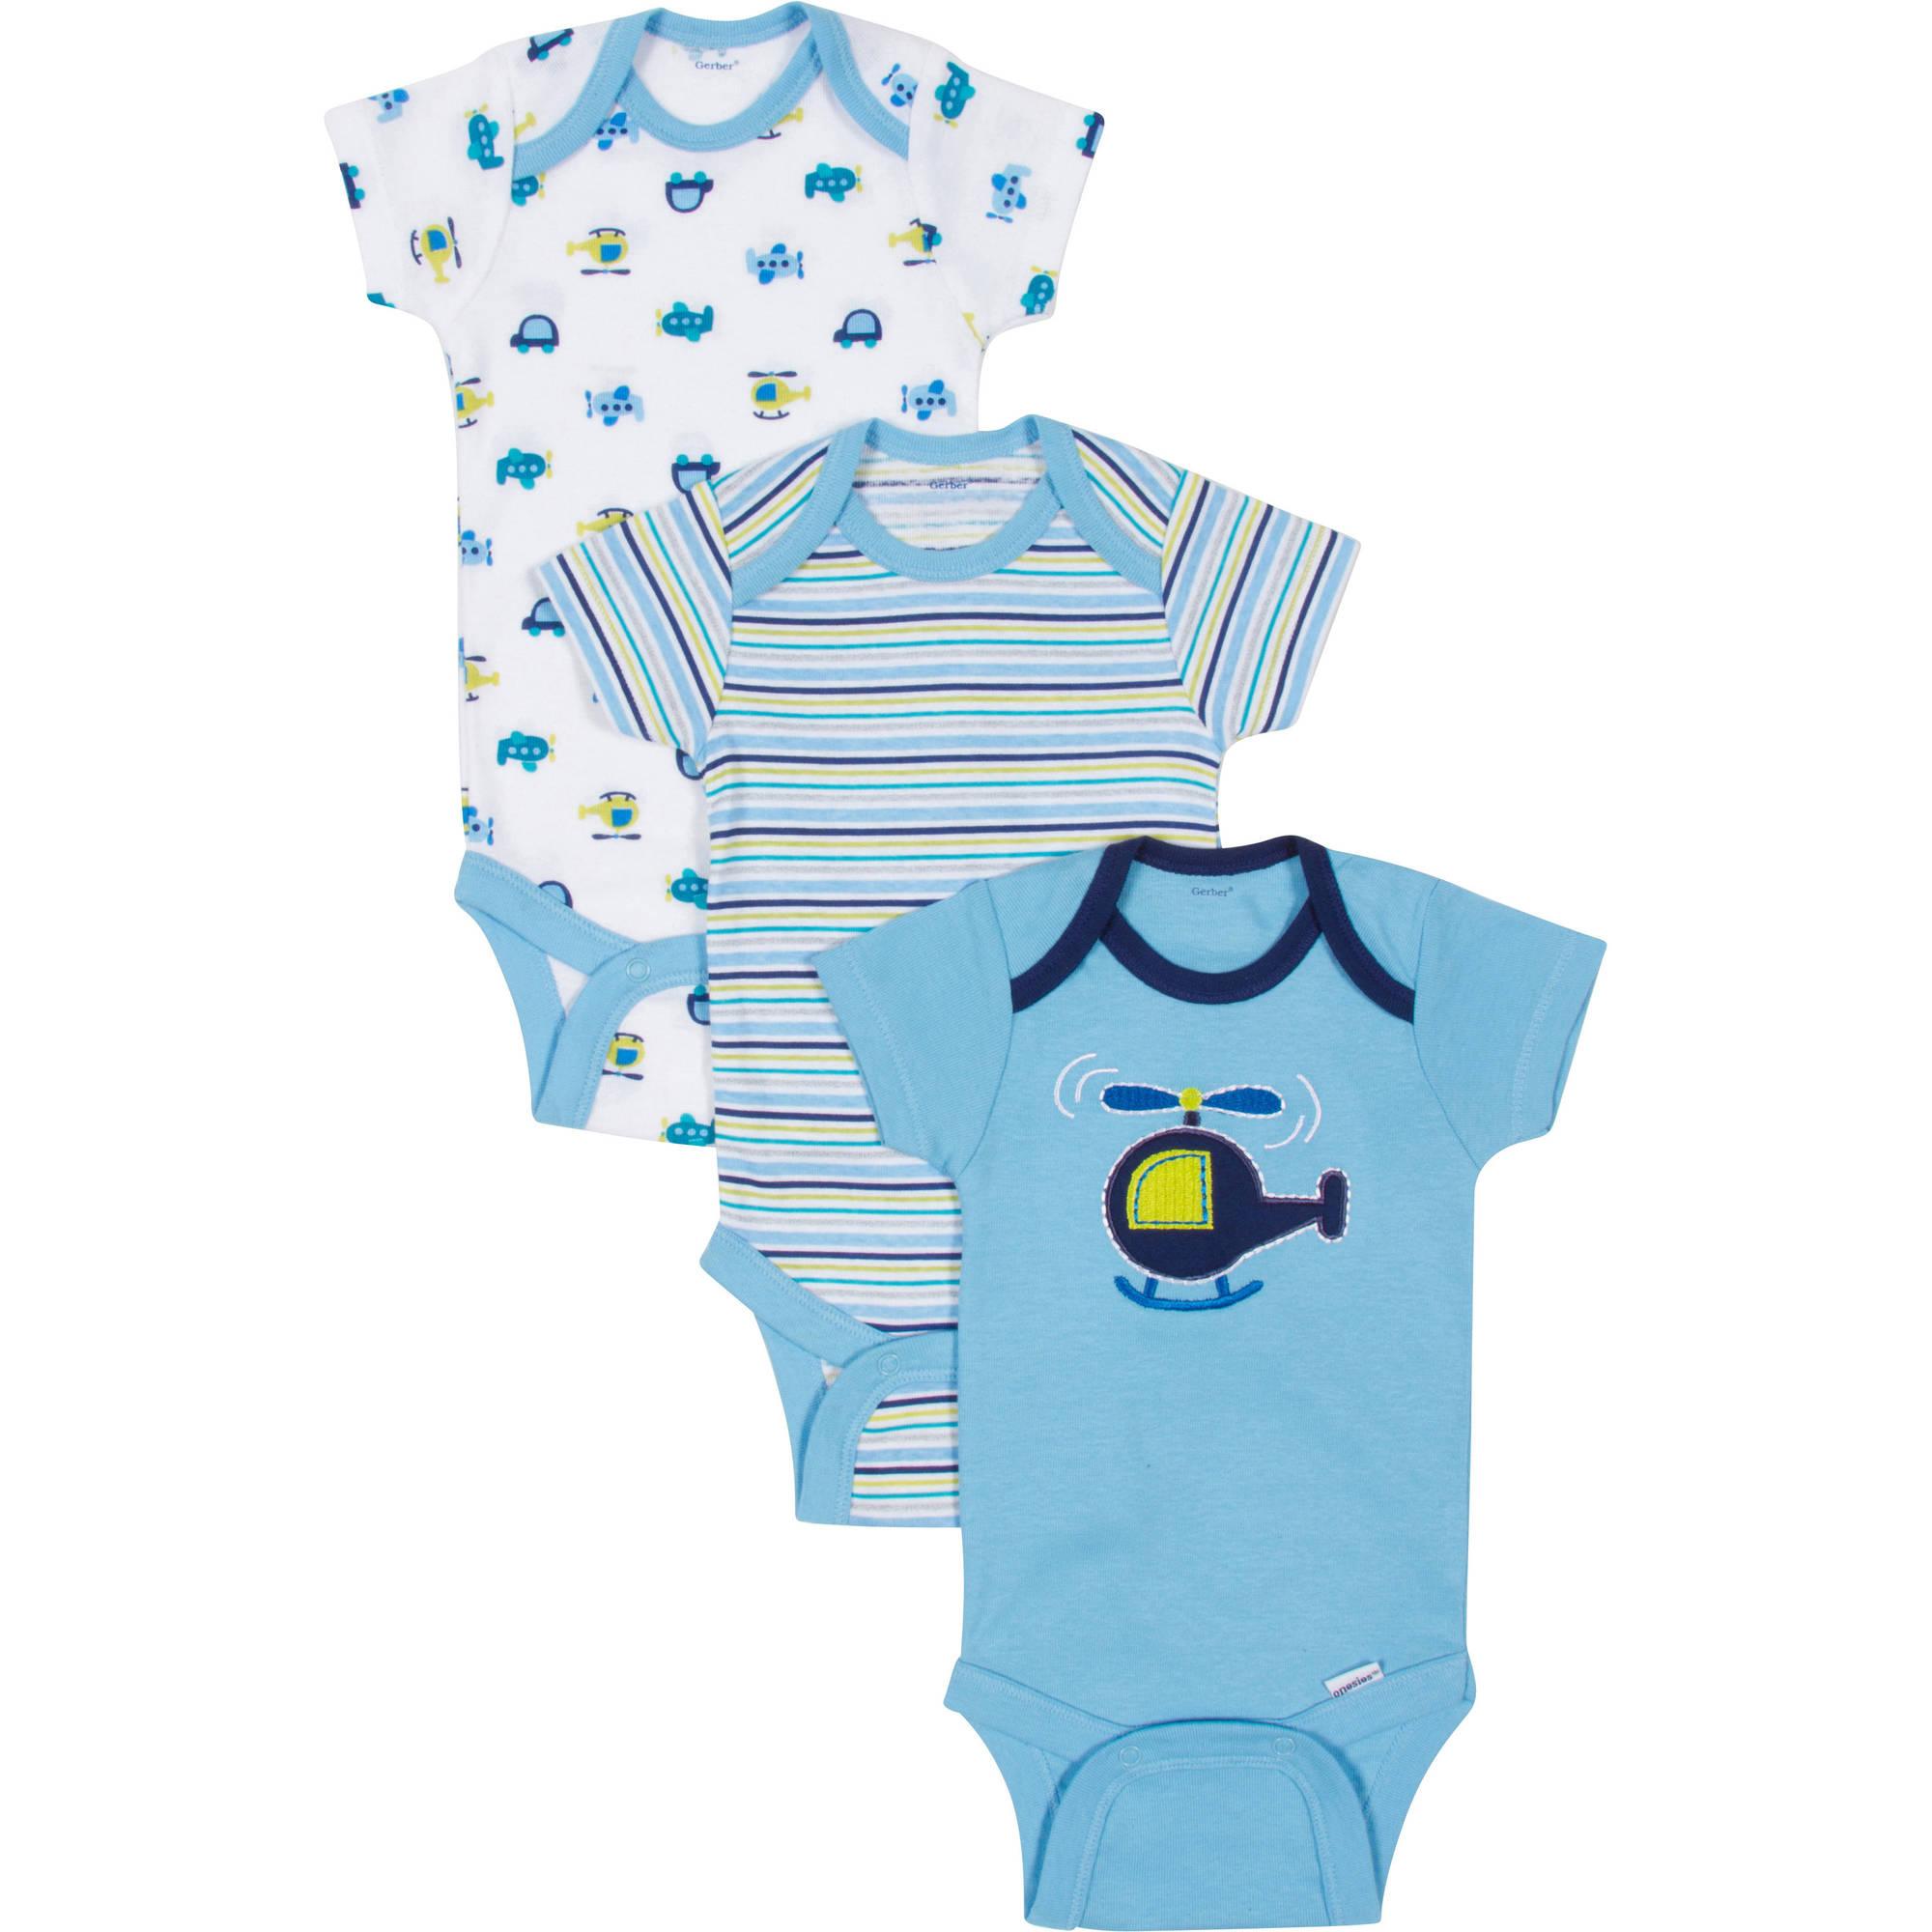 Gerber Newborn Baby Boy Bodysuits Variety, 3-Pack